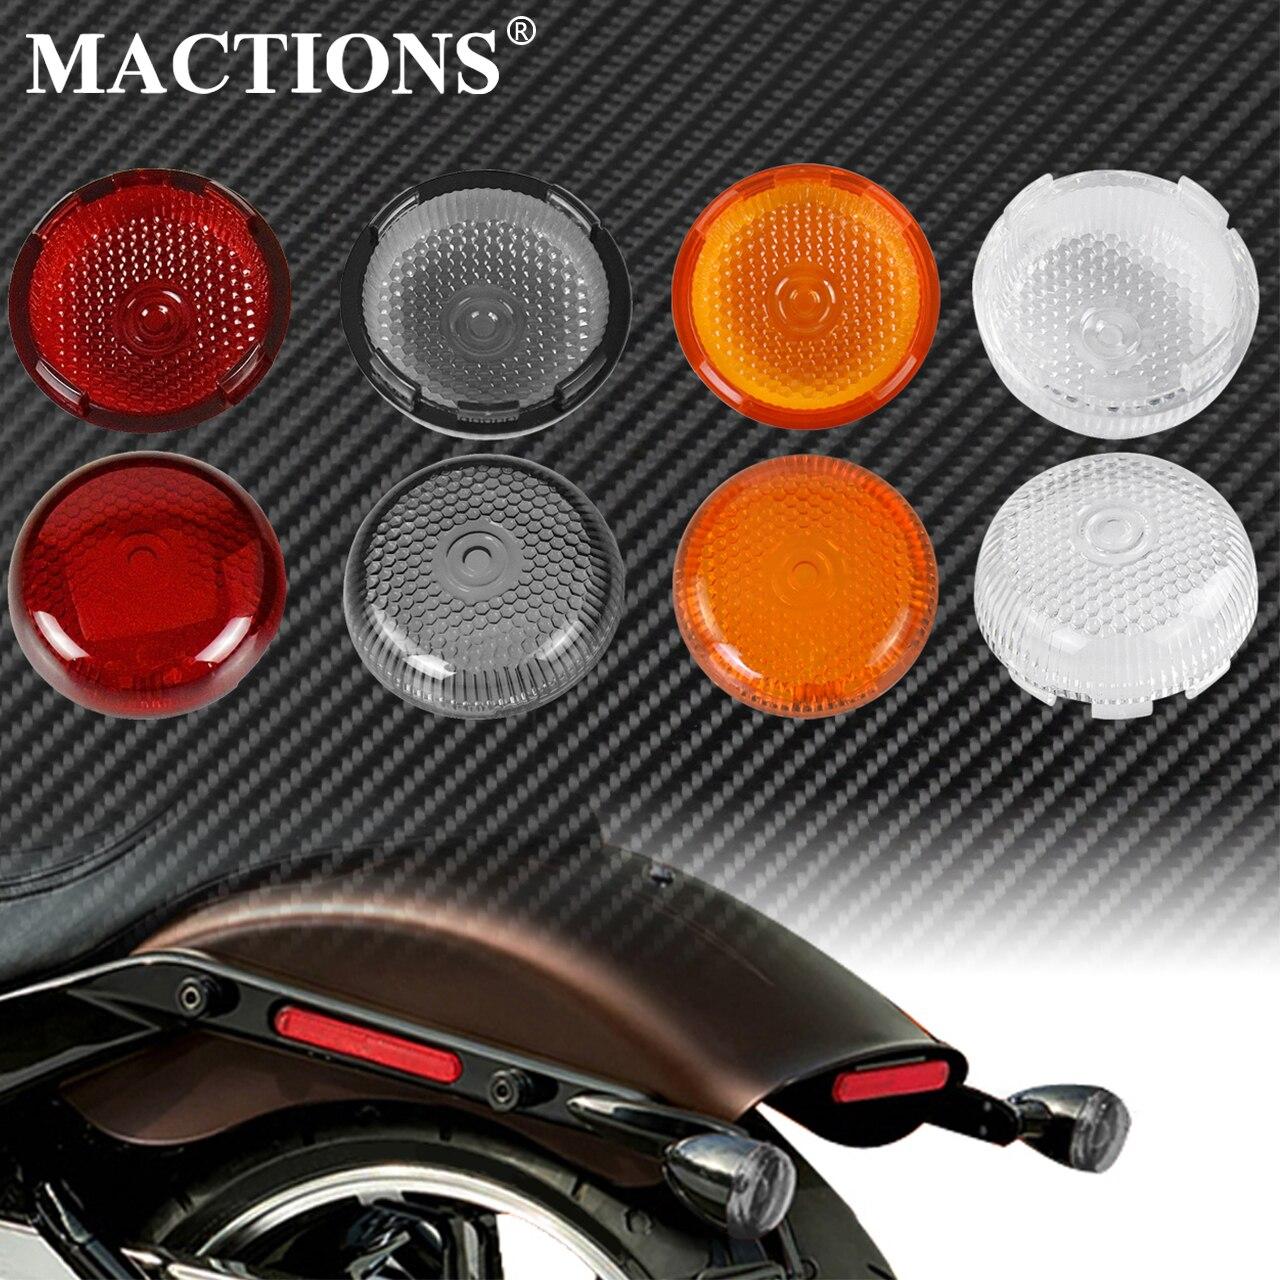 Couvercle de lobjectif du feu clignotant   Moto, 2 pièces, pour indicateur, Harley Softail Heritage Touring Road King Dyna Fatboy Sportster